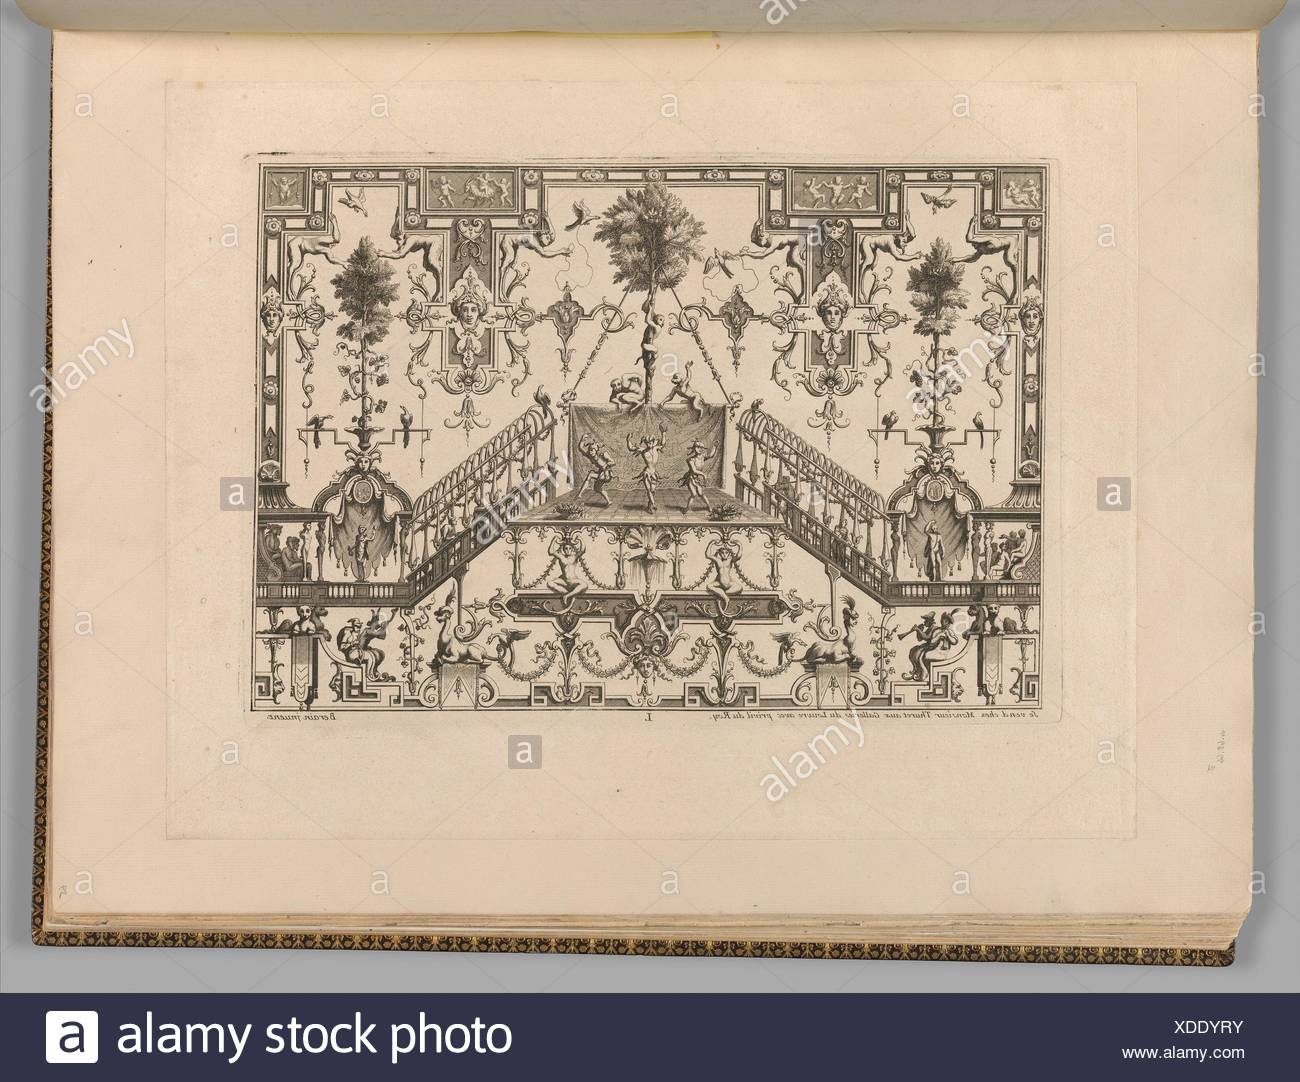 Ornament Designs Invented by J. Berain. Artist and publisher: Jean Berain (French, Saint-Mihiel 1640-1711 Paris); Dedicatee: Jules Hardouin Mansart - Stock Image